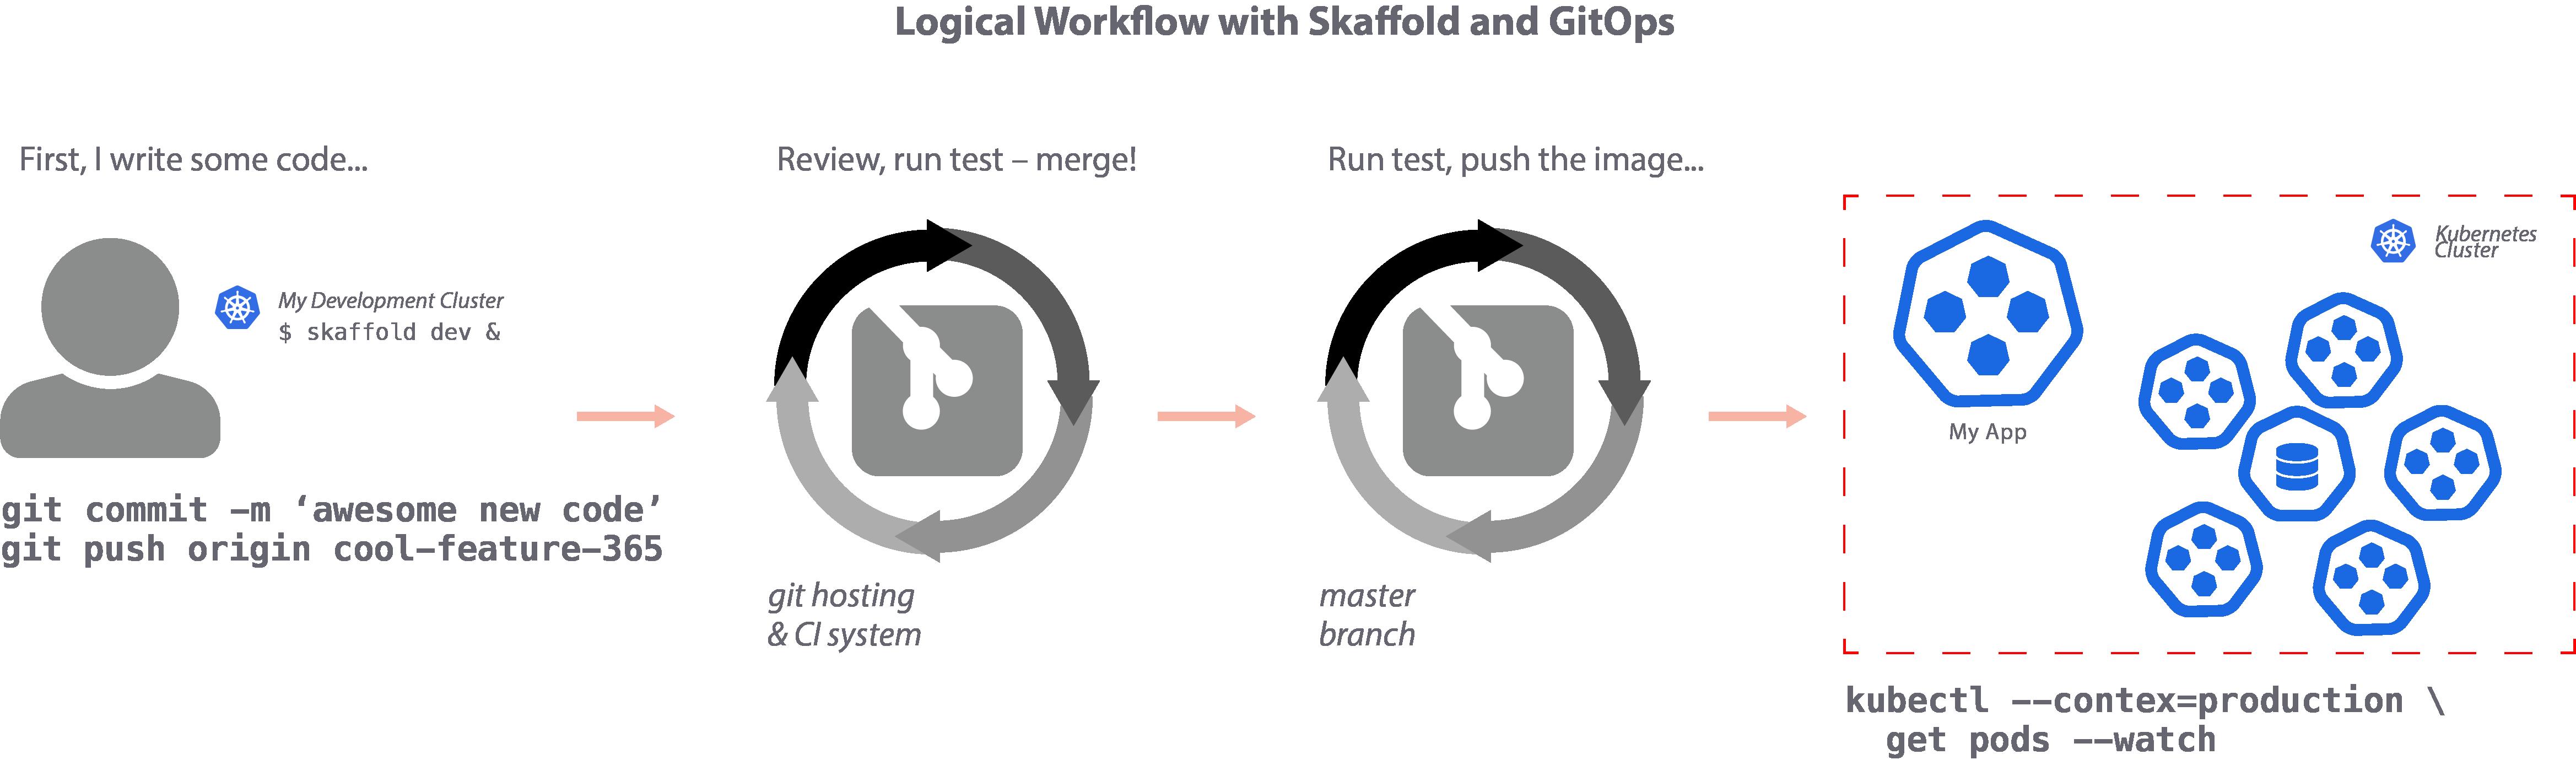 skaffold_workflow.png